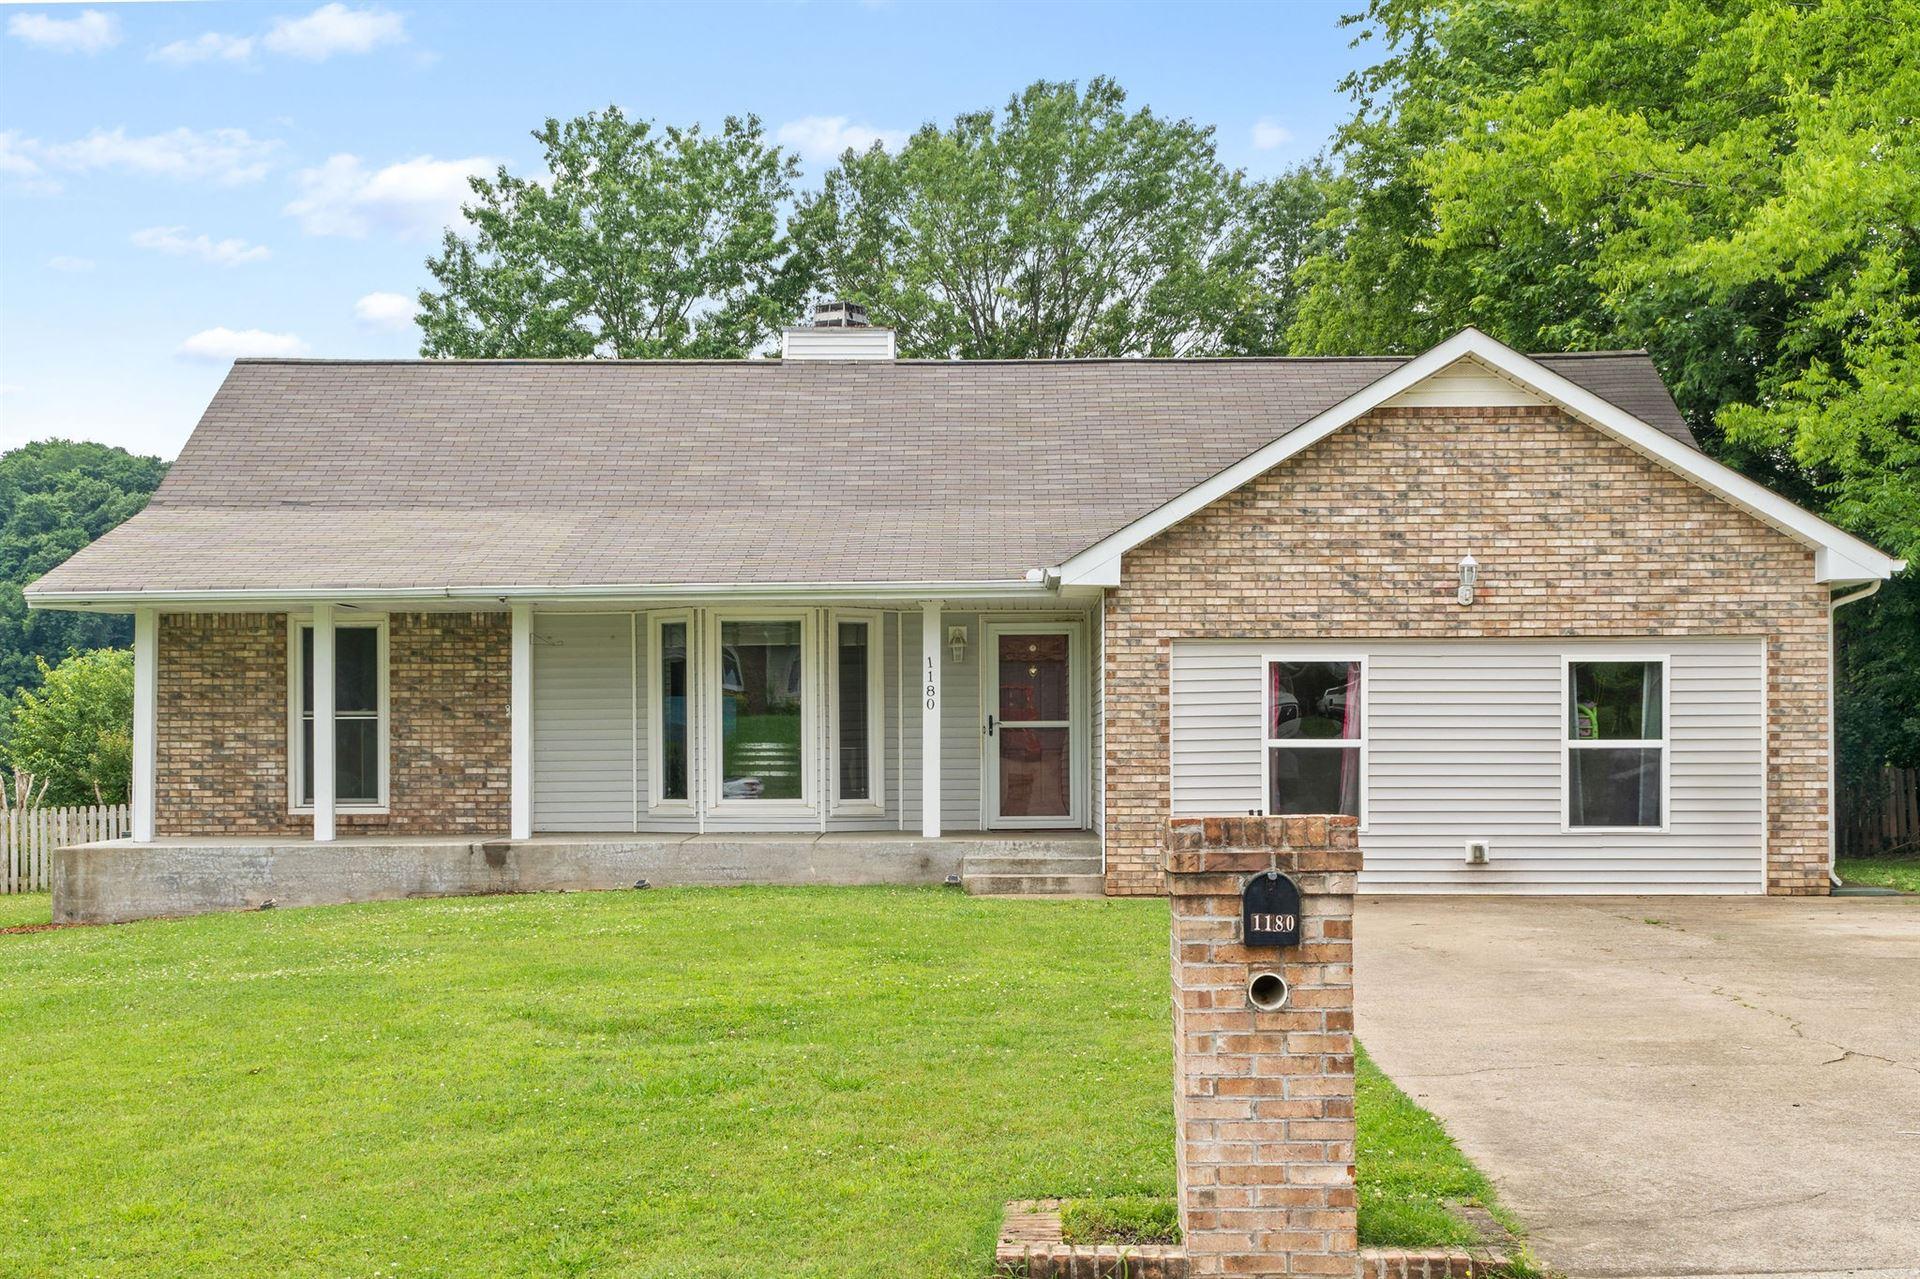 1180 Willow Bend Dr, Clarksville, TN 37043 - MLS#: 2261828